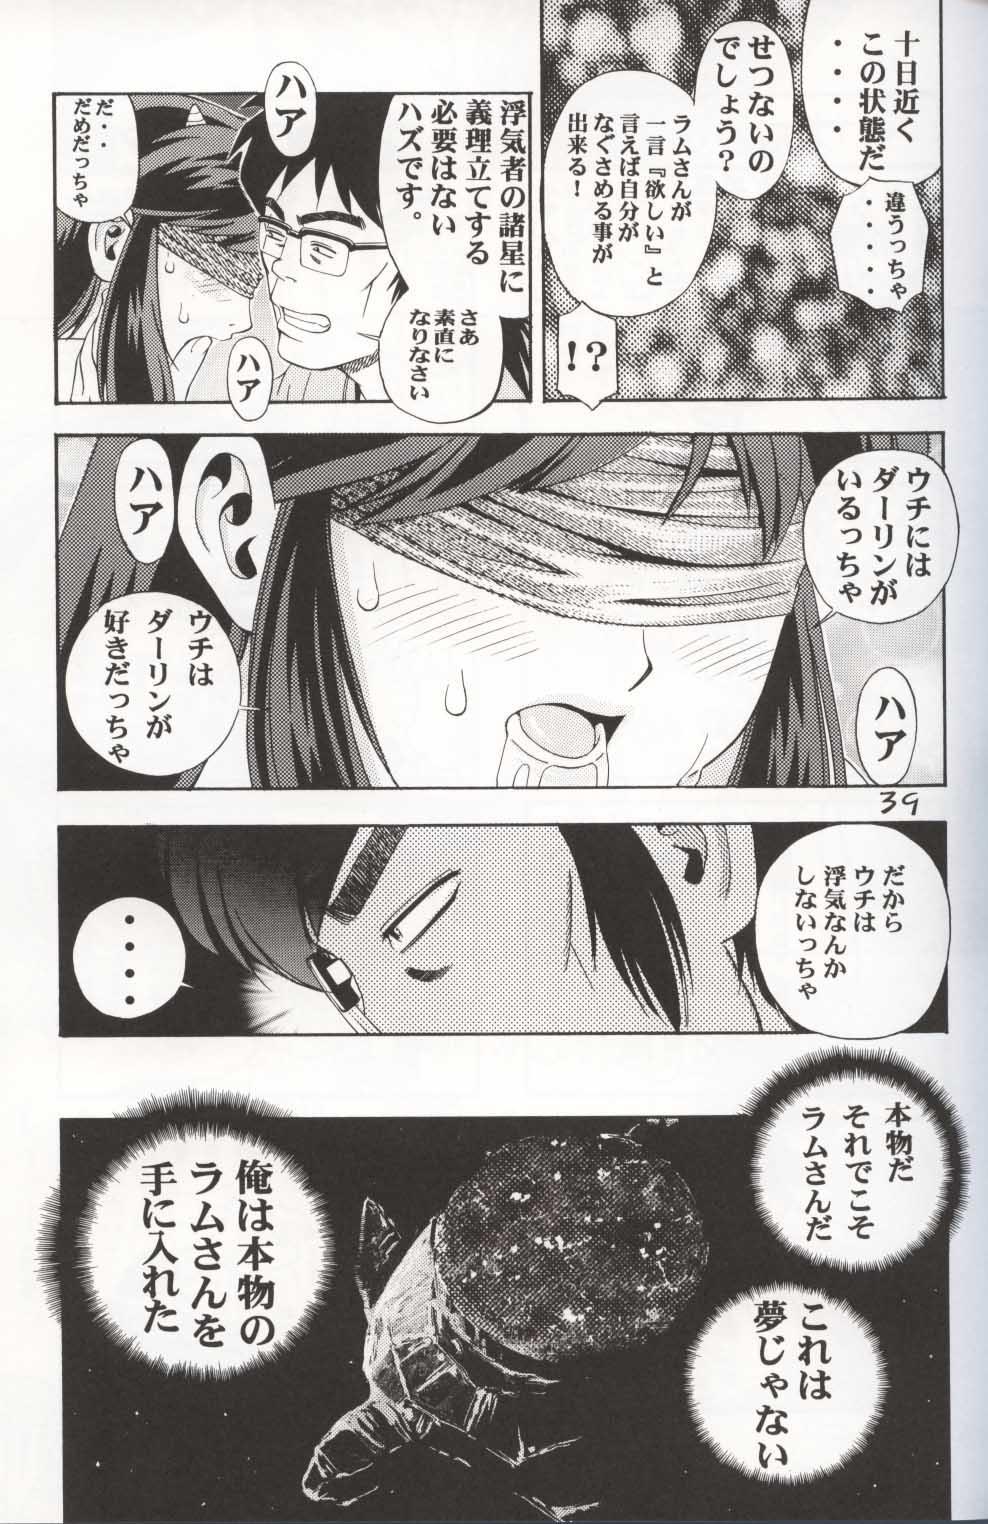 GIRL POWER Vol.10 37